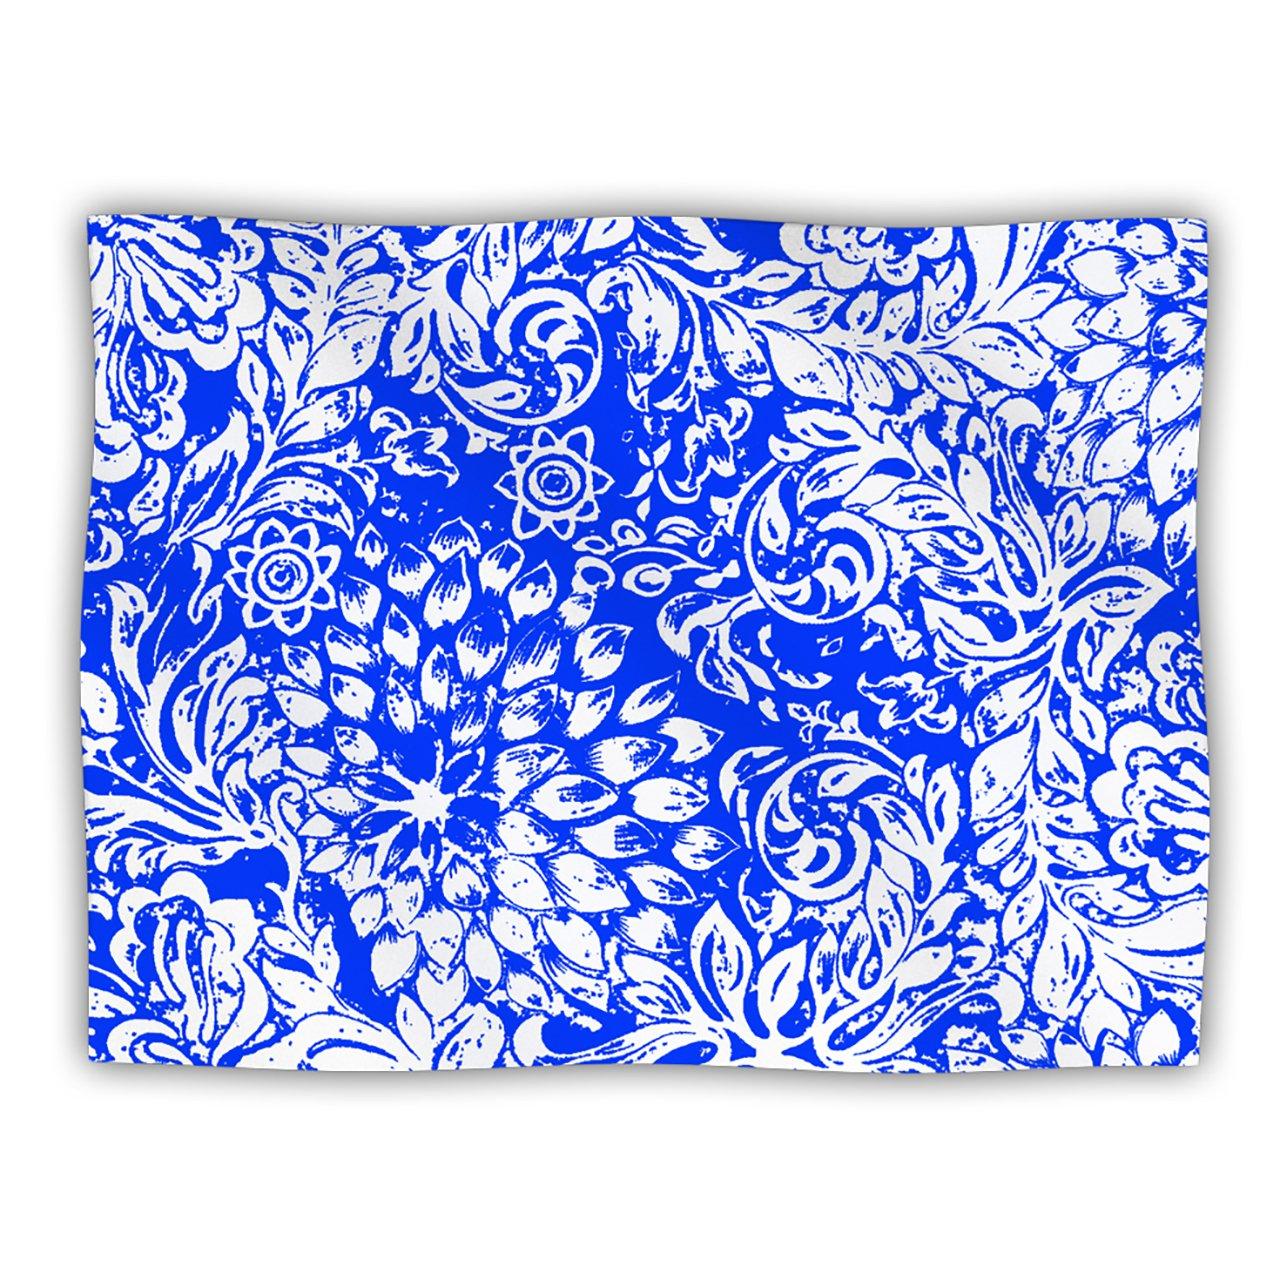 KESS InHouse Vikki Salmela Bloom Blue for You Pet Blanket, 60 by 50-Inch